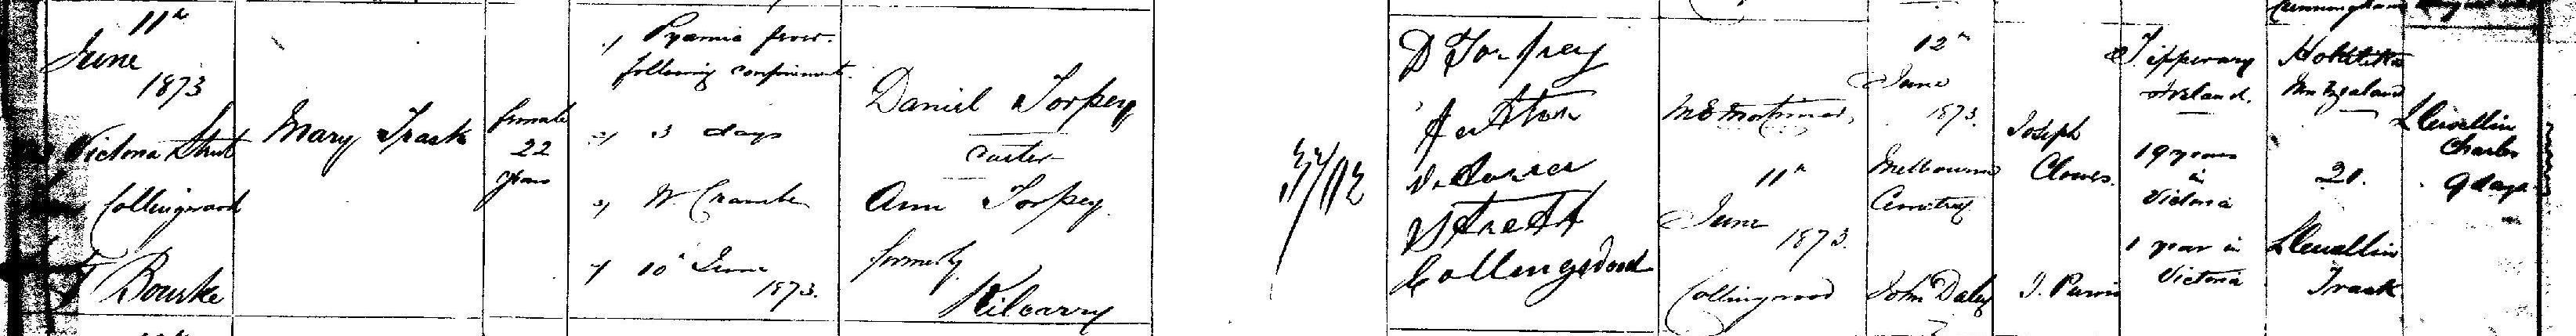 Mary Trask nee Torpey Death 1873cr